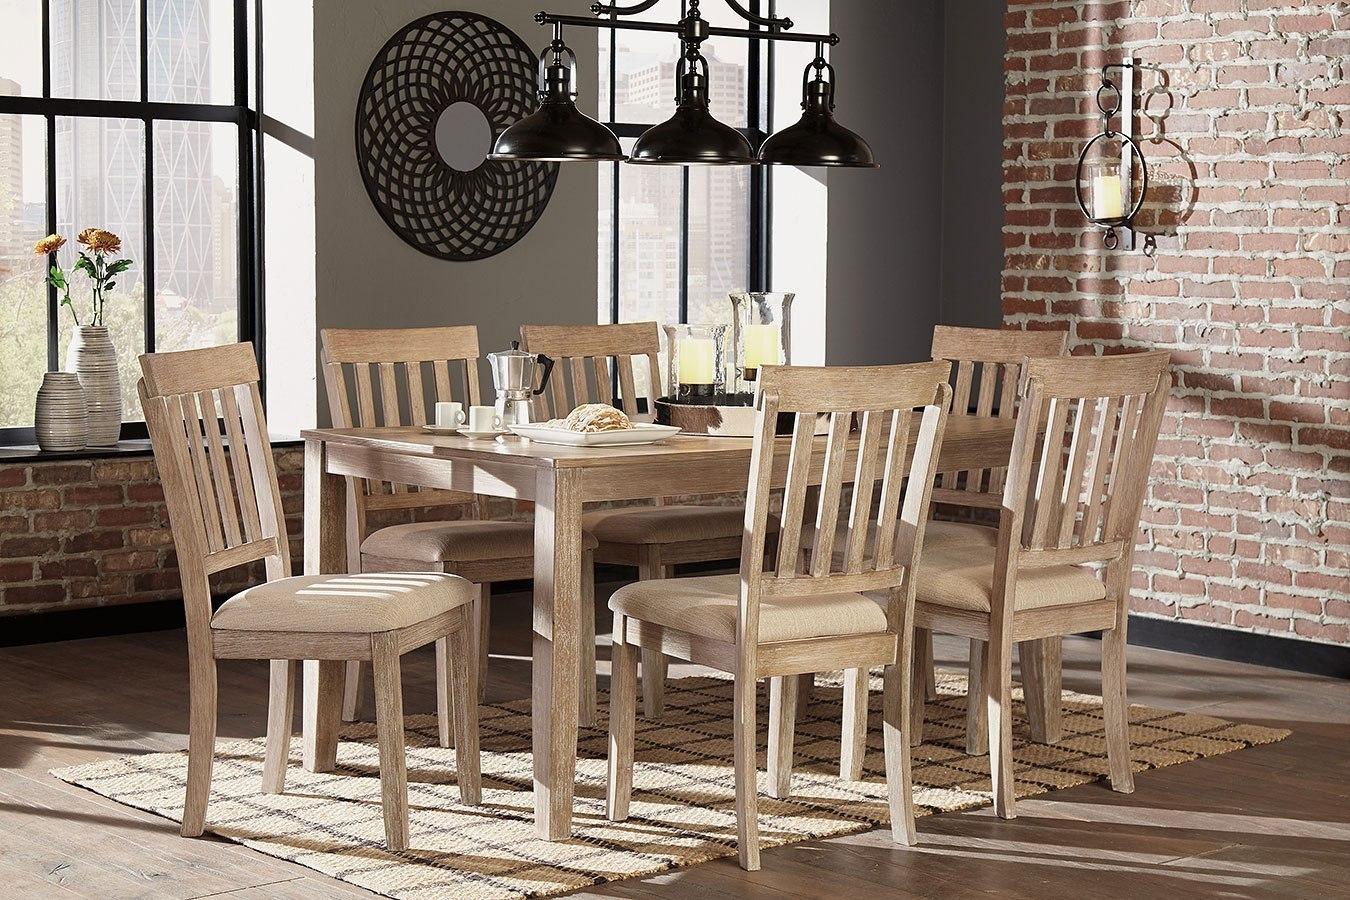 Mattilone 7-Piece Dining Room Set by Benchcraft ...